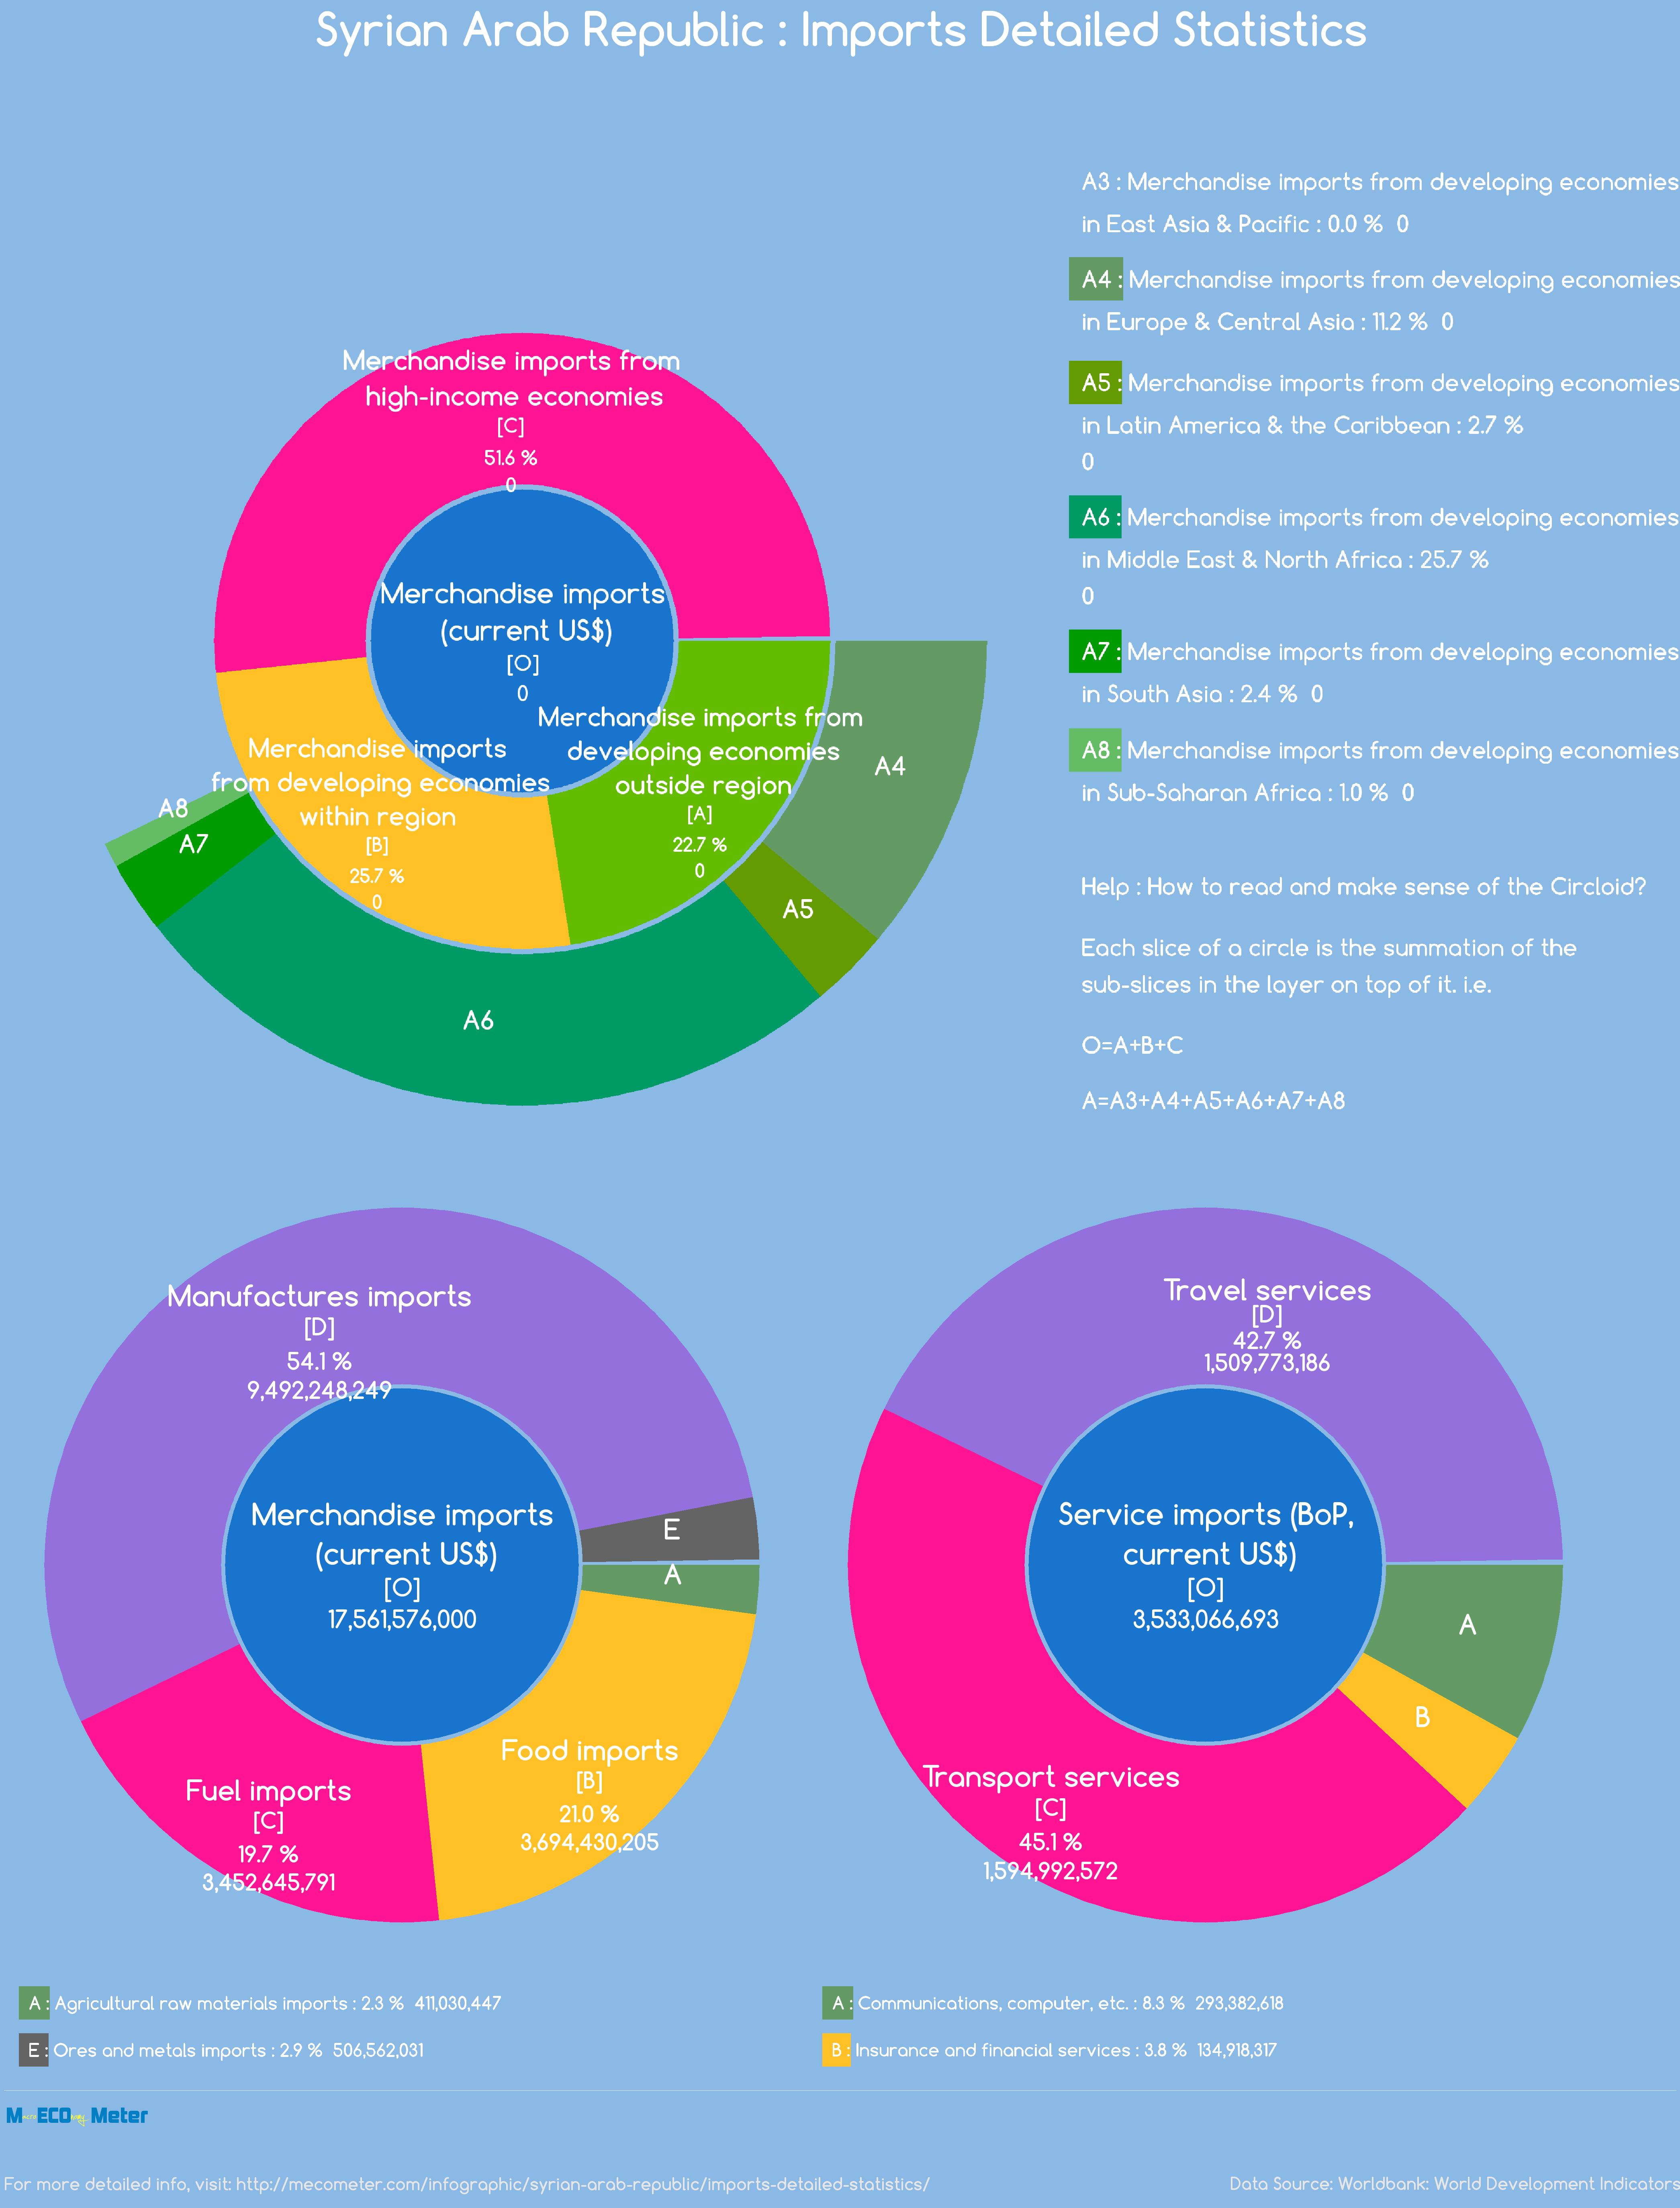 Syrian Arab Republic : Imports Detailed Statistics